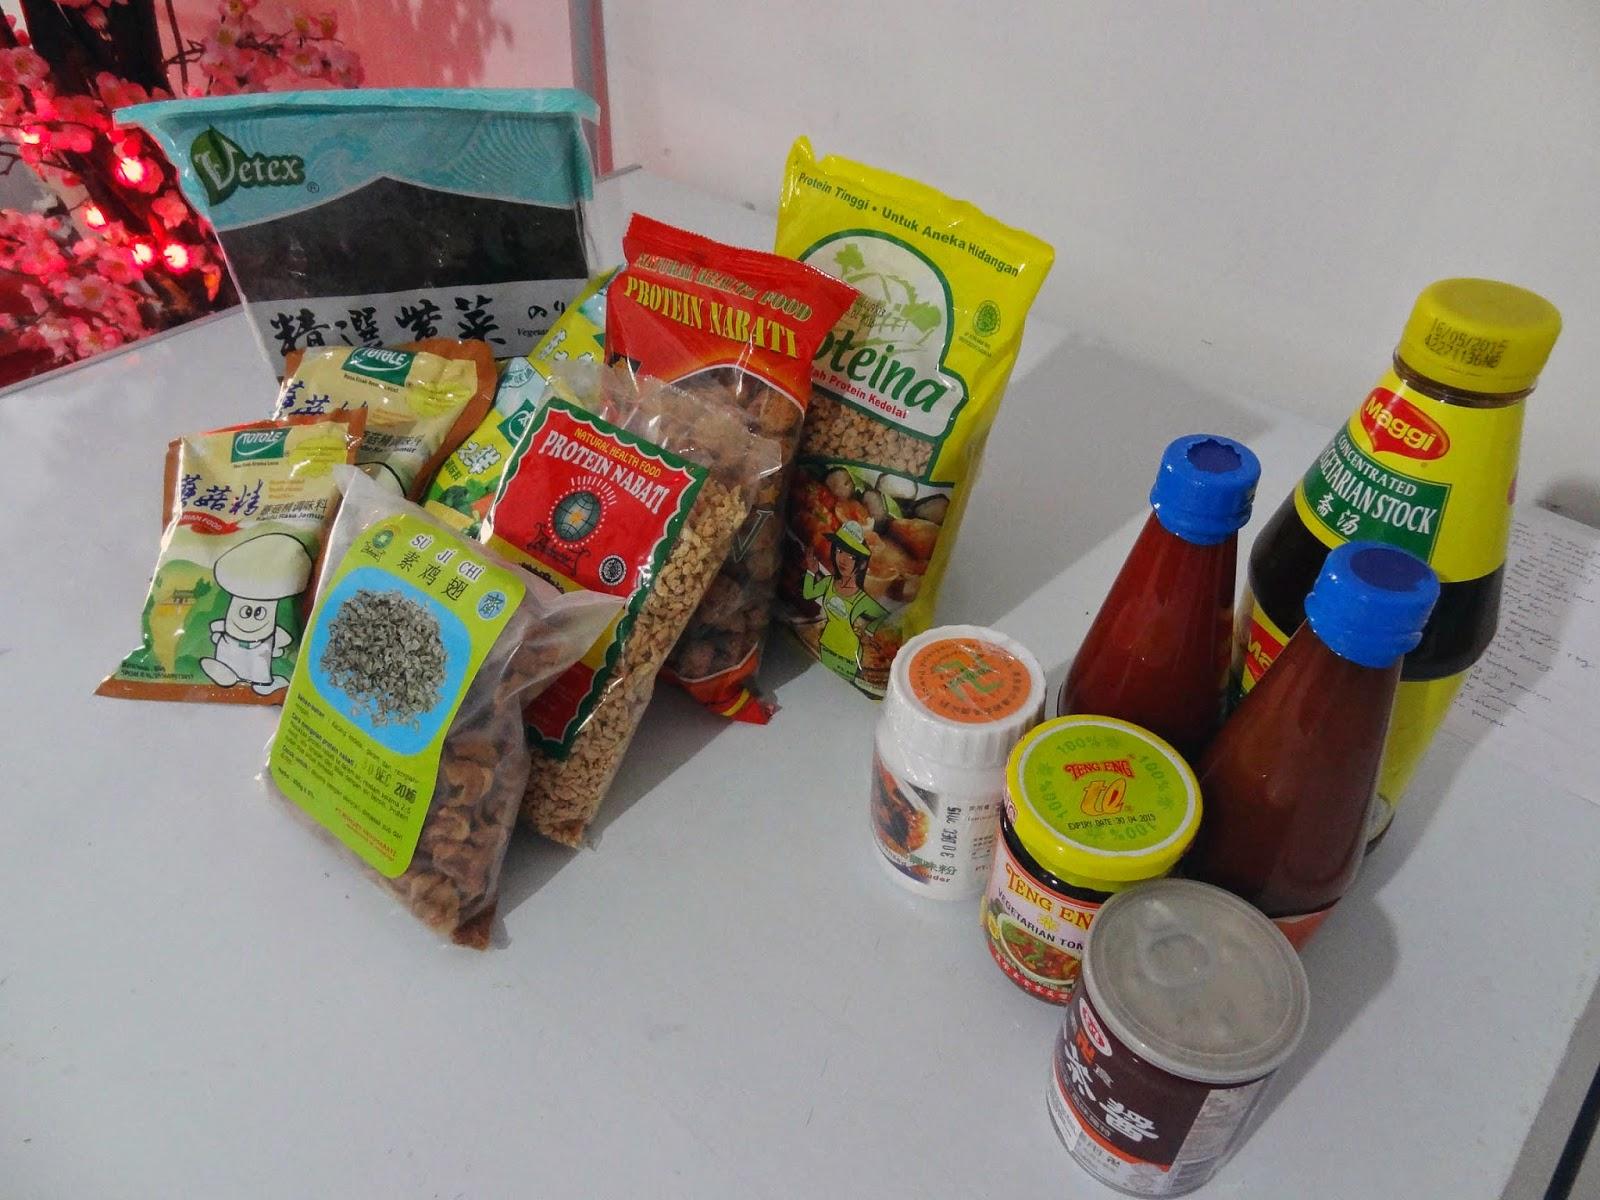 Toko Vegetarian Denpasar Bali - H&S Vegetarian Shop